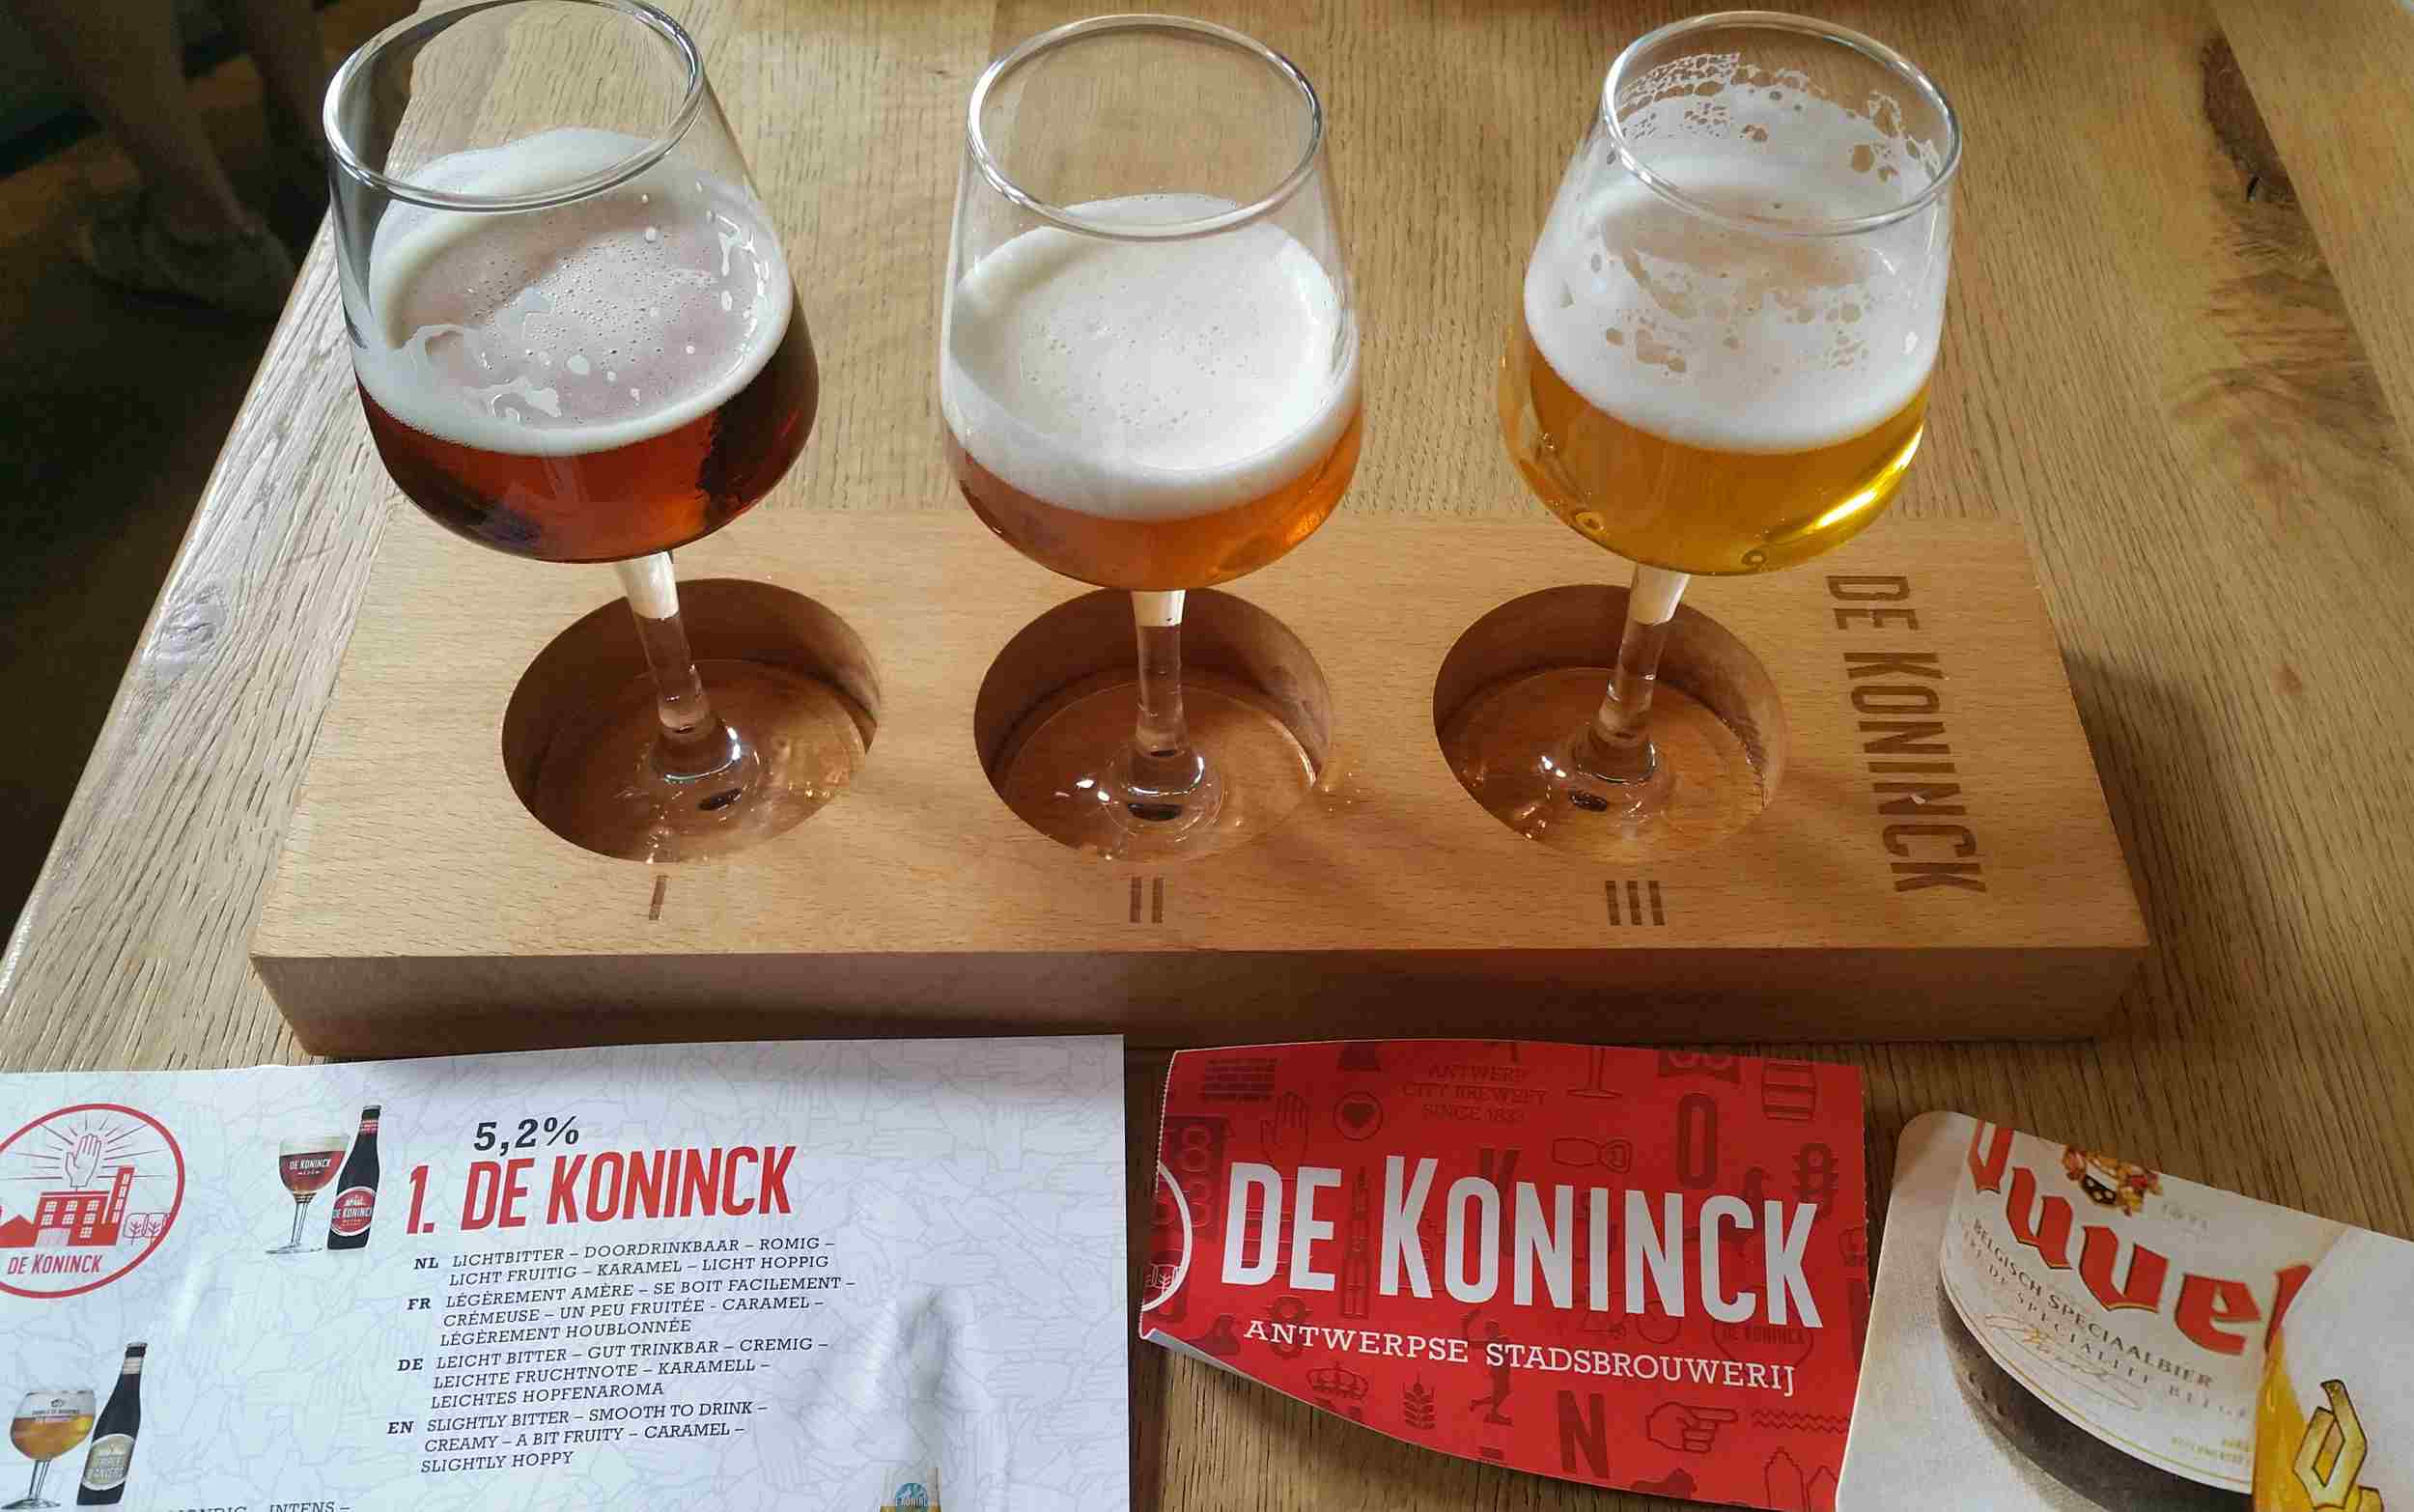 Cata de cerveza Duvel en Bélgica